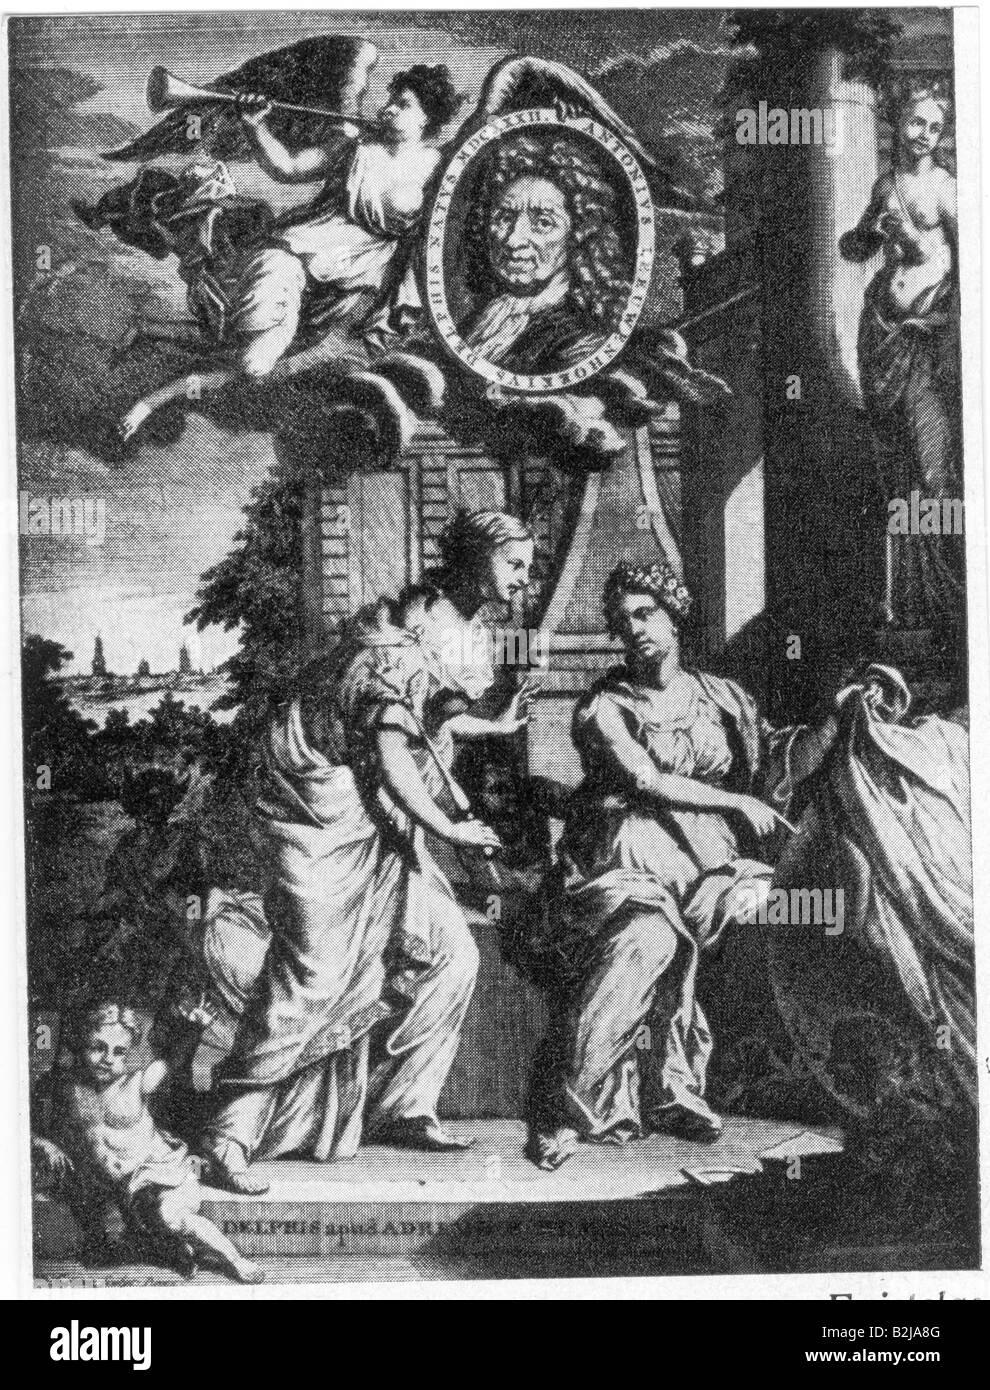 Leeuwenhoek, Antoni van, 24.10.1632 - 27.8.1723, Dutch scientist, frontispiece, of 'Epistolae Physiologicae', - Stock Image